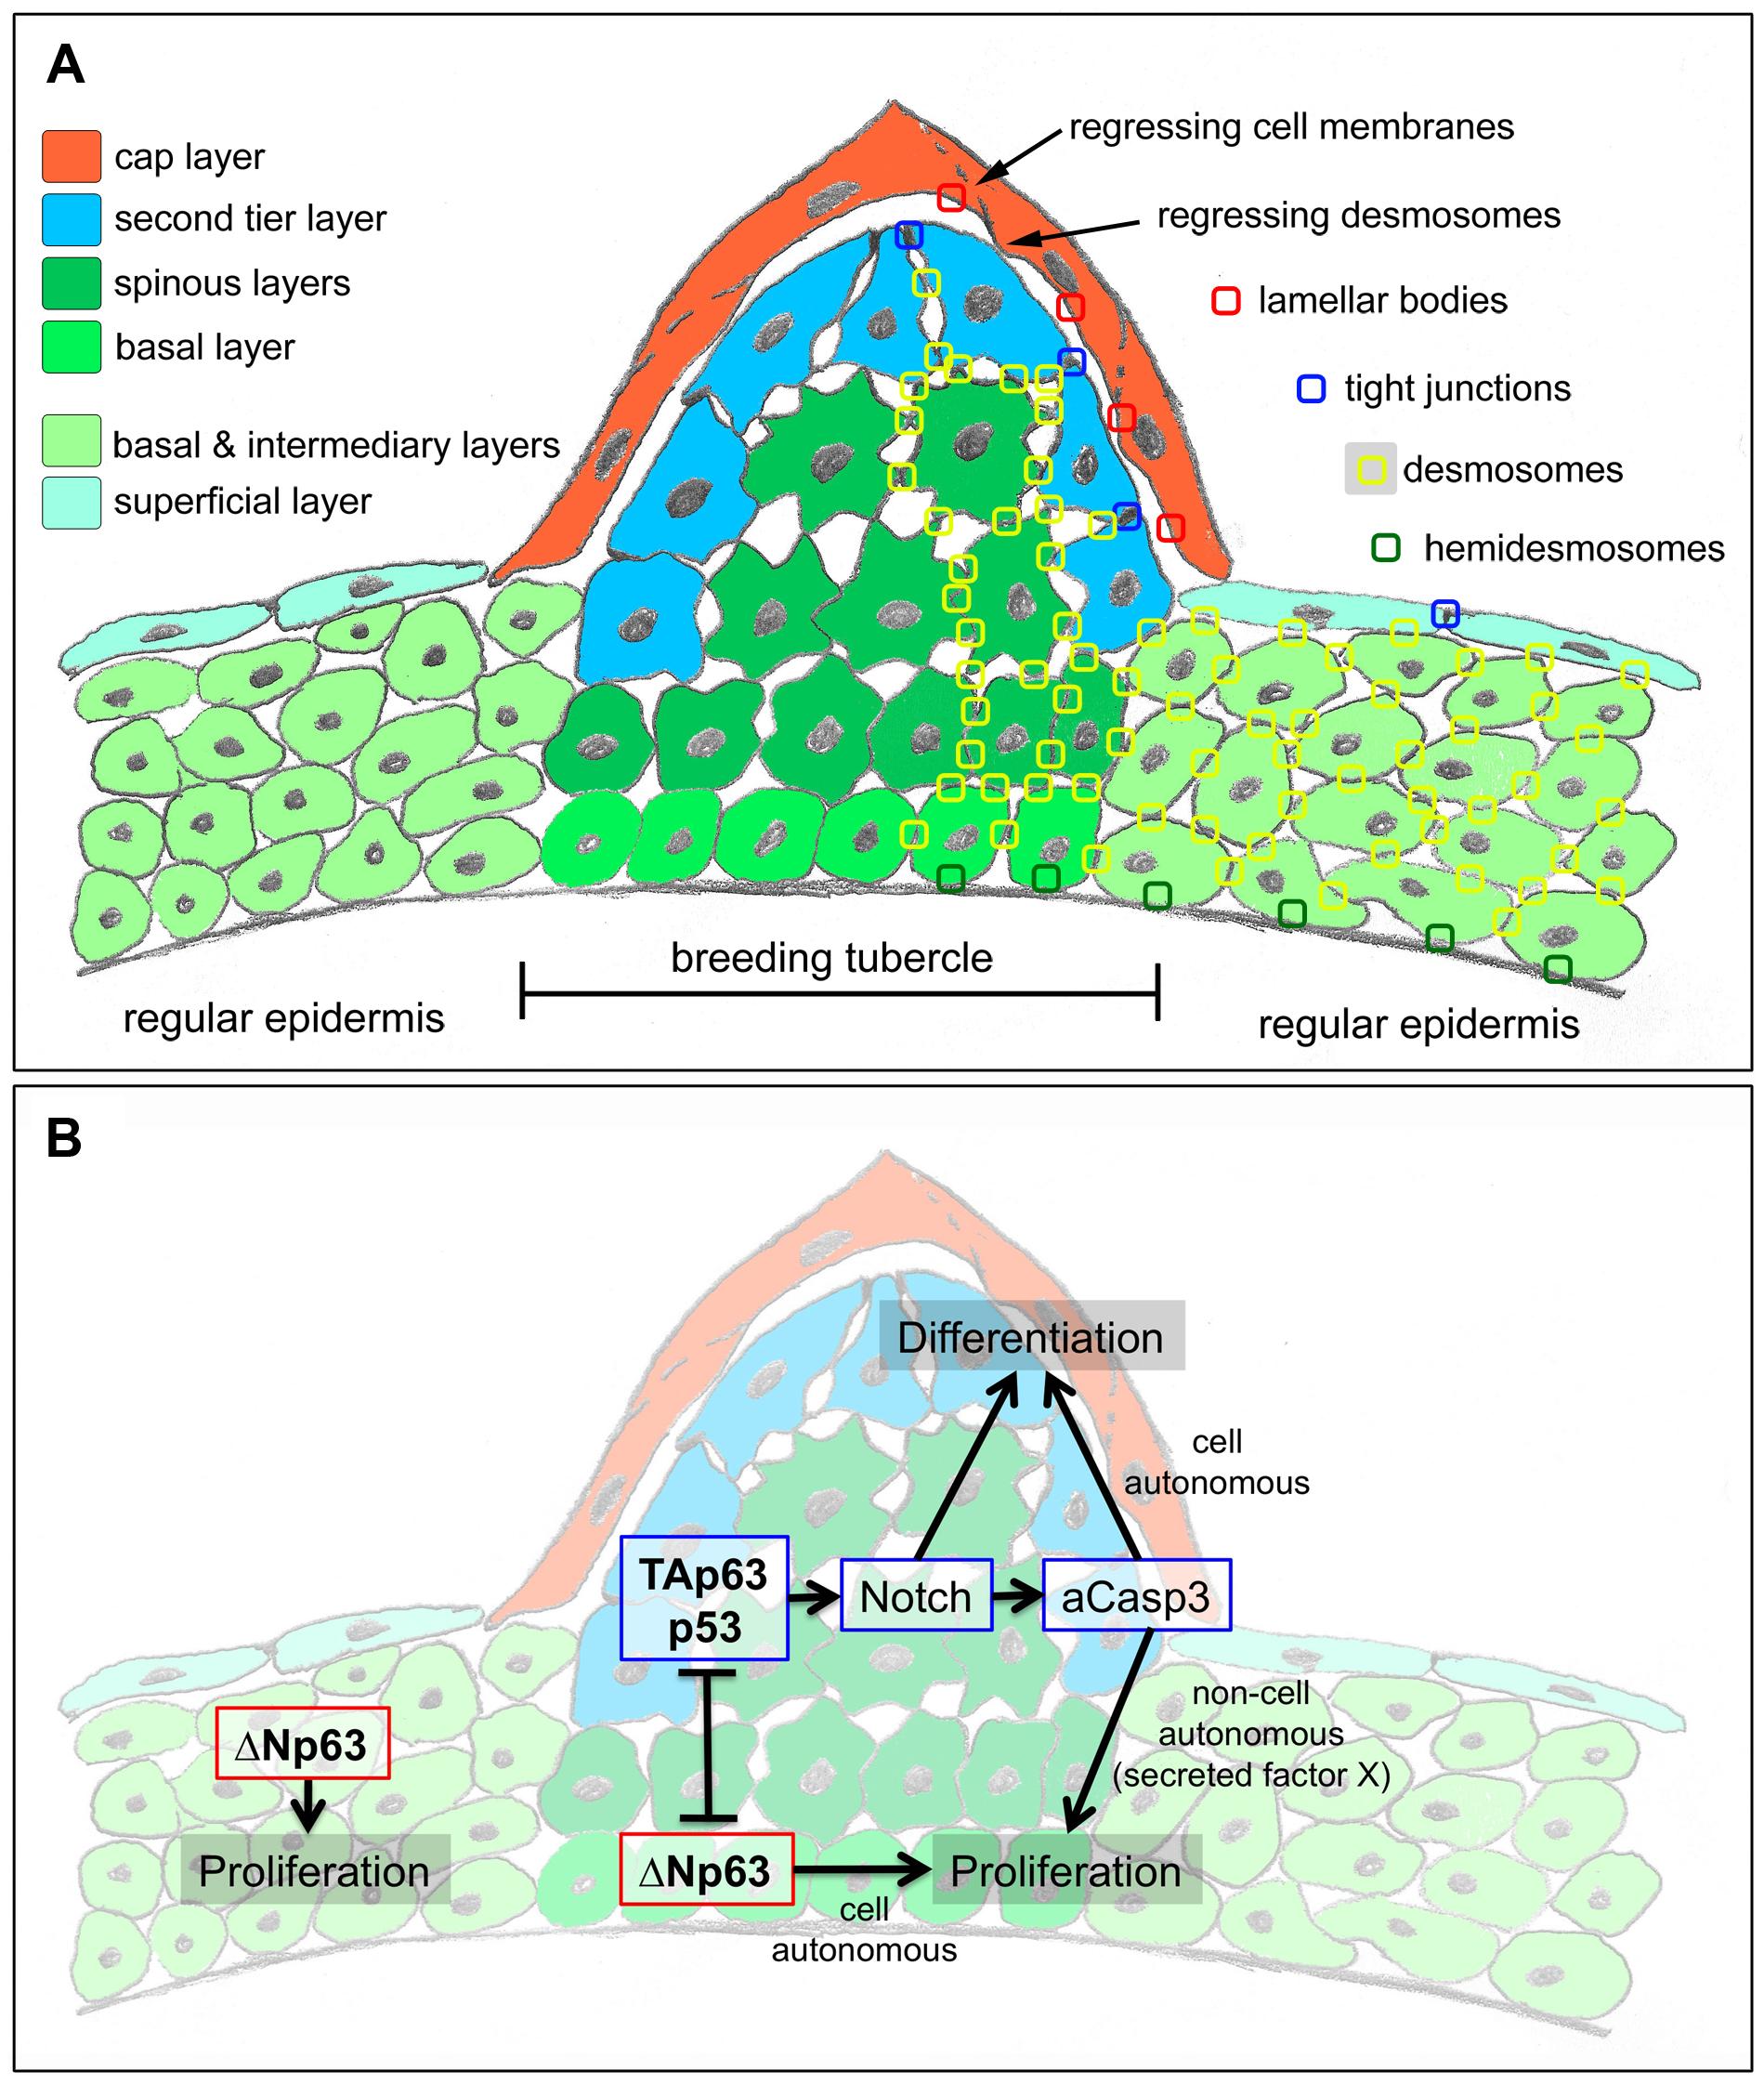 Schematics of breeding tubercle organization and regulation.